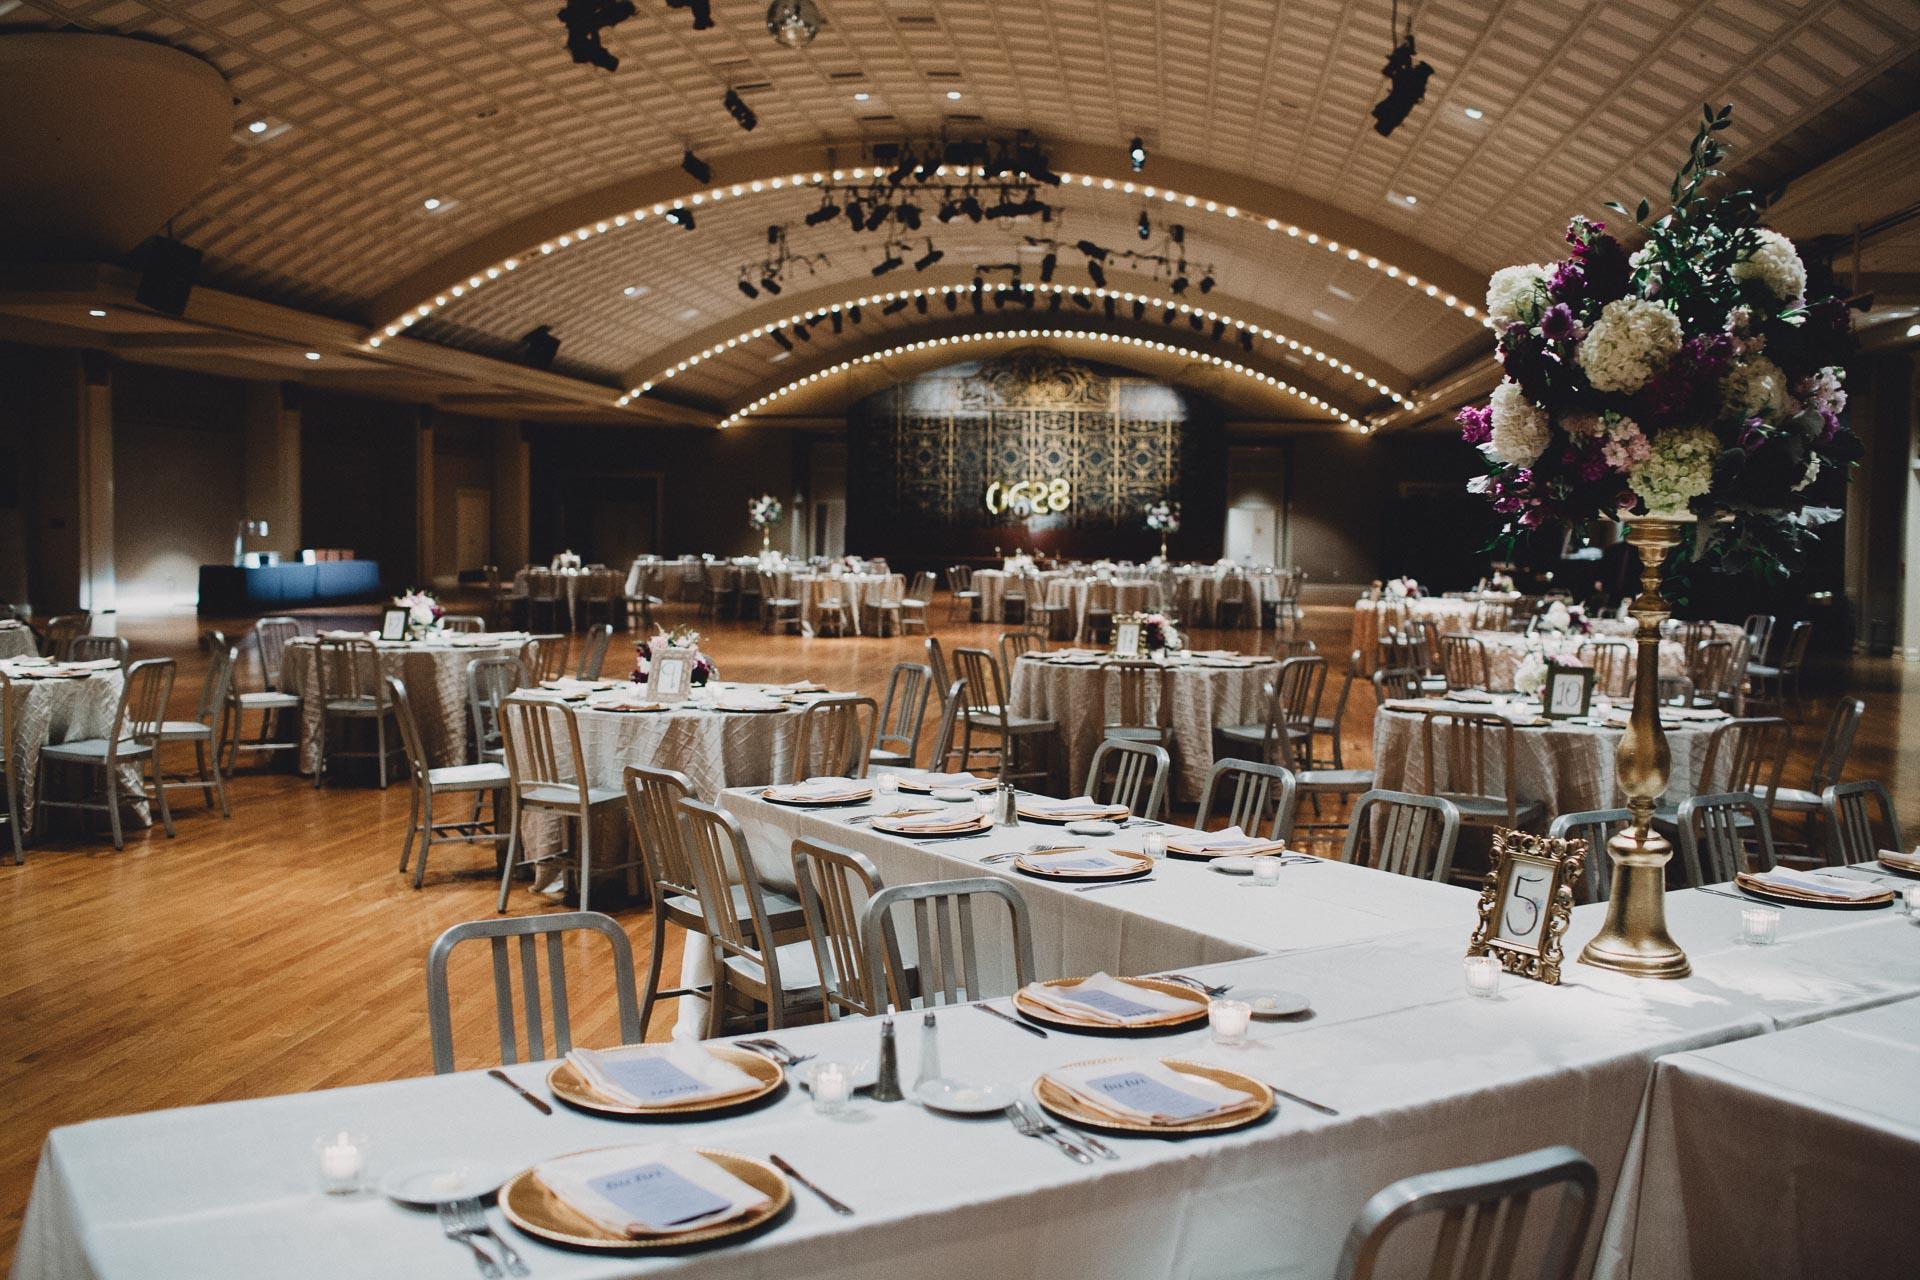 Julia-Michael-Cincinnati-Music-Hall-Wedding-125@2x.jpg